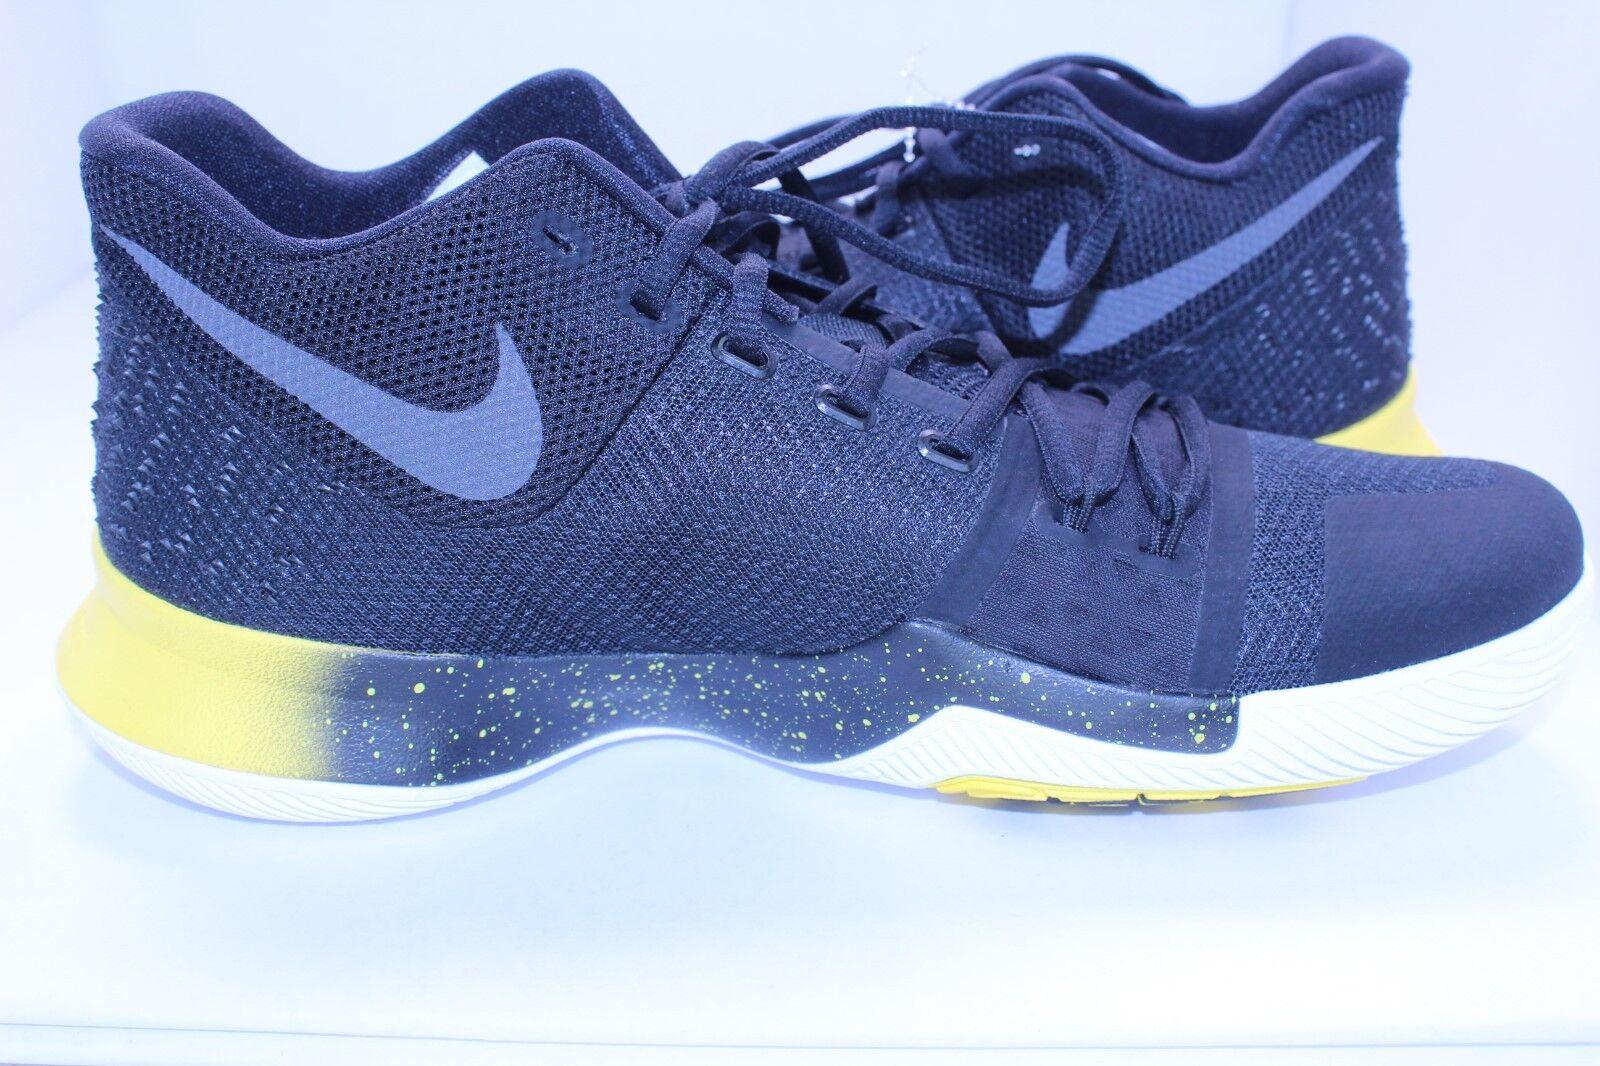 Nike Kyrie 3 Basketball shoes Mamba Black Yellow White SZ 11.5